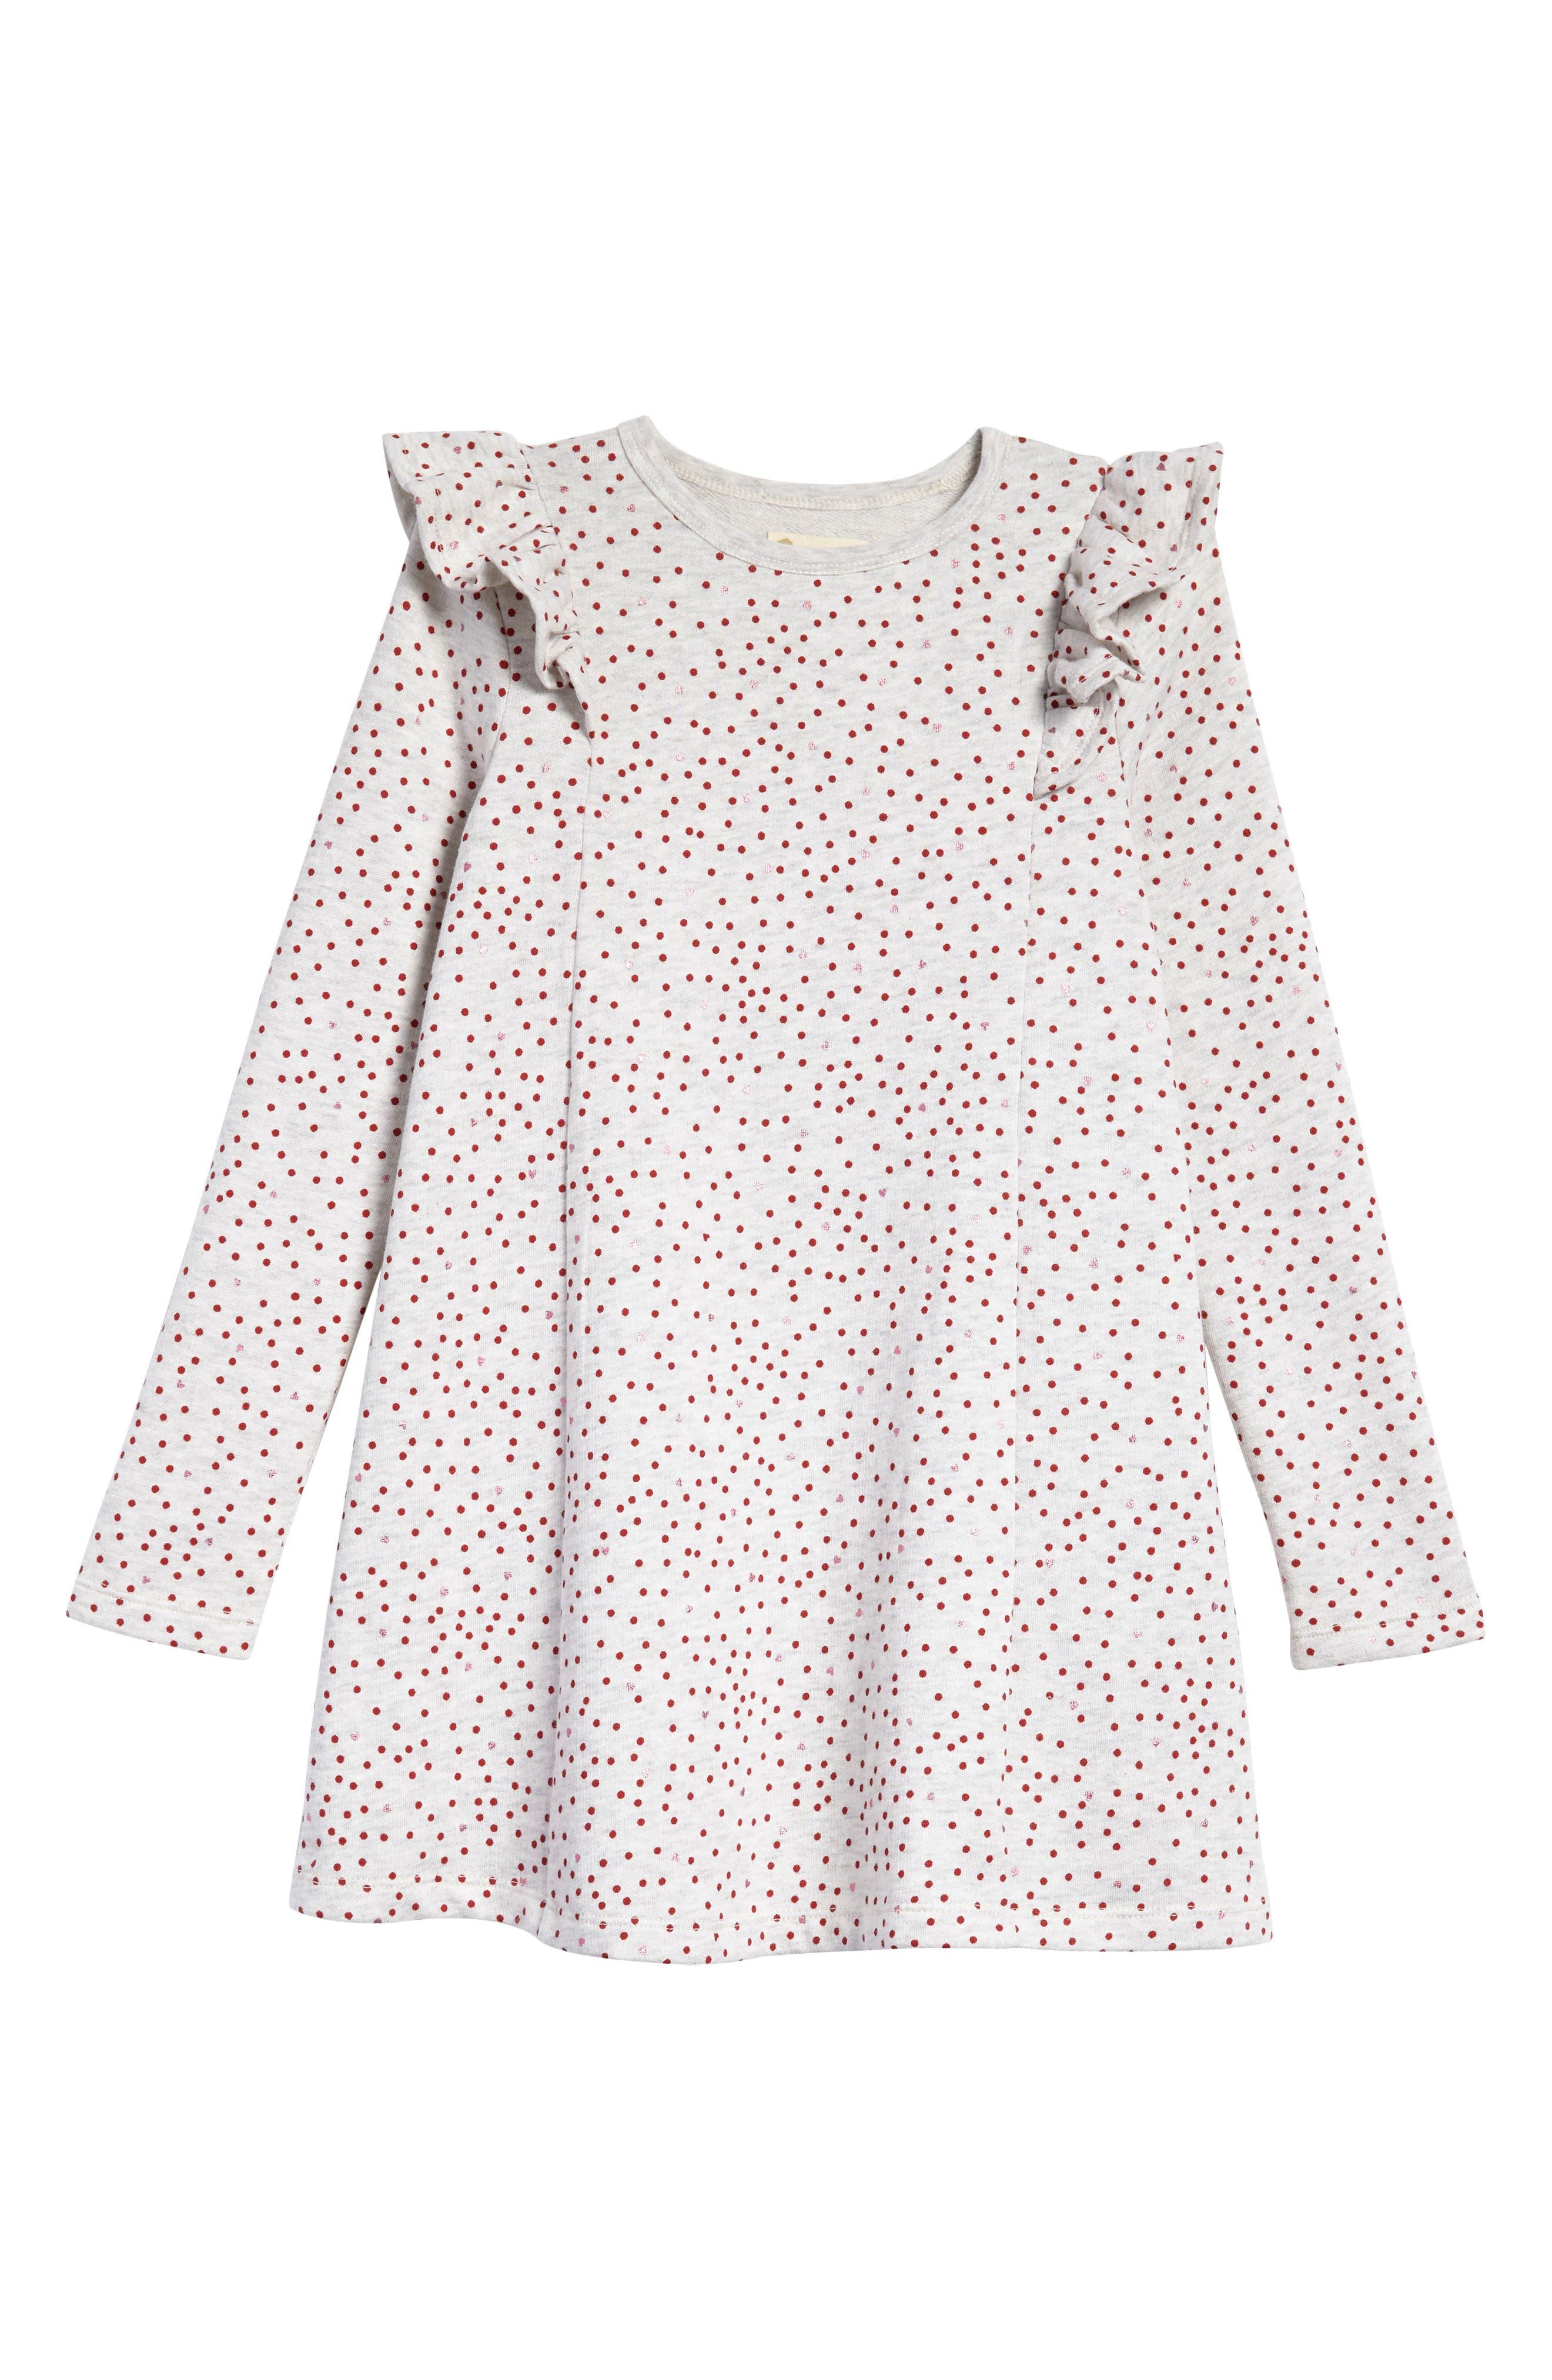 Ruffle Fleece Sweater Dress,                             Main thumbnail 1, color,                             IVORY EGRET HEATHER HEARTS